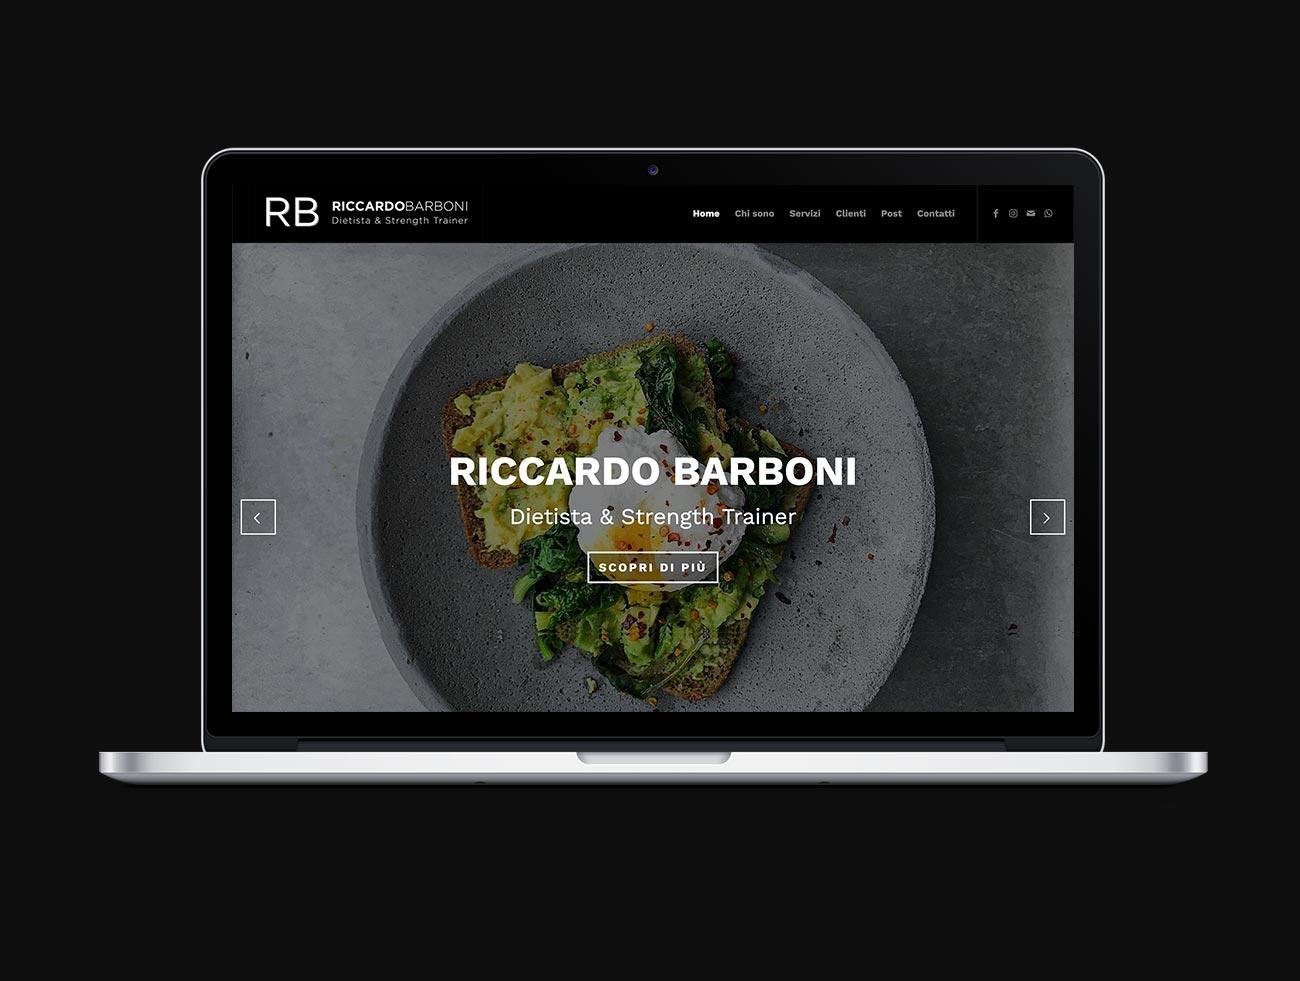 riccardo-barboni-body-recomp-ancona_gazpa